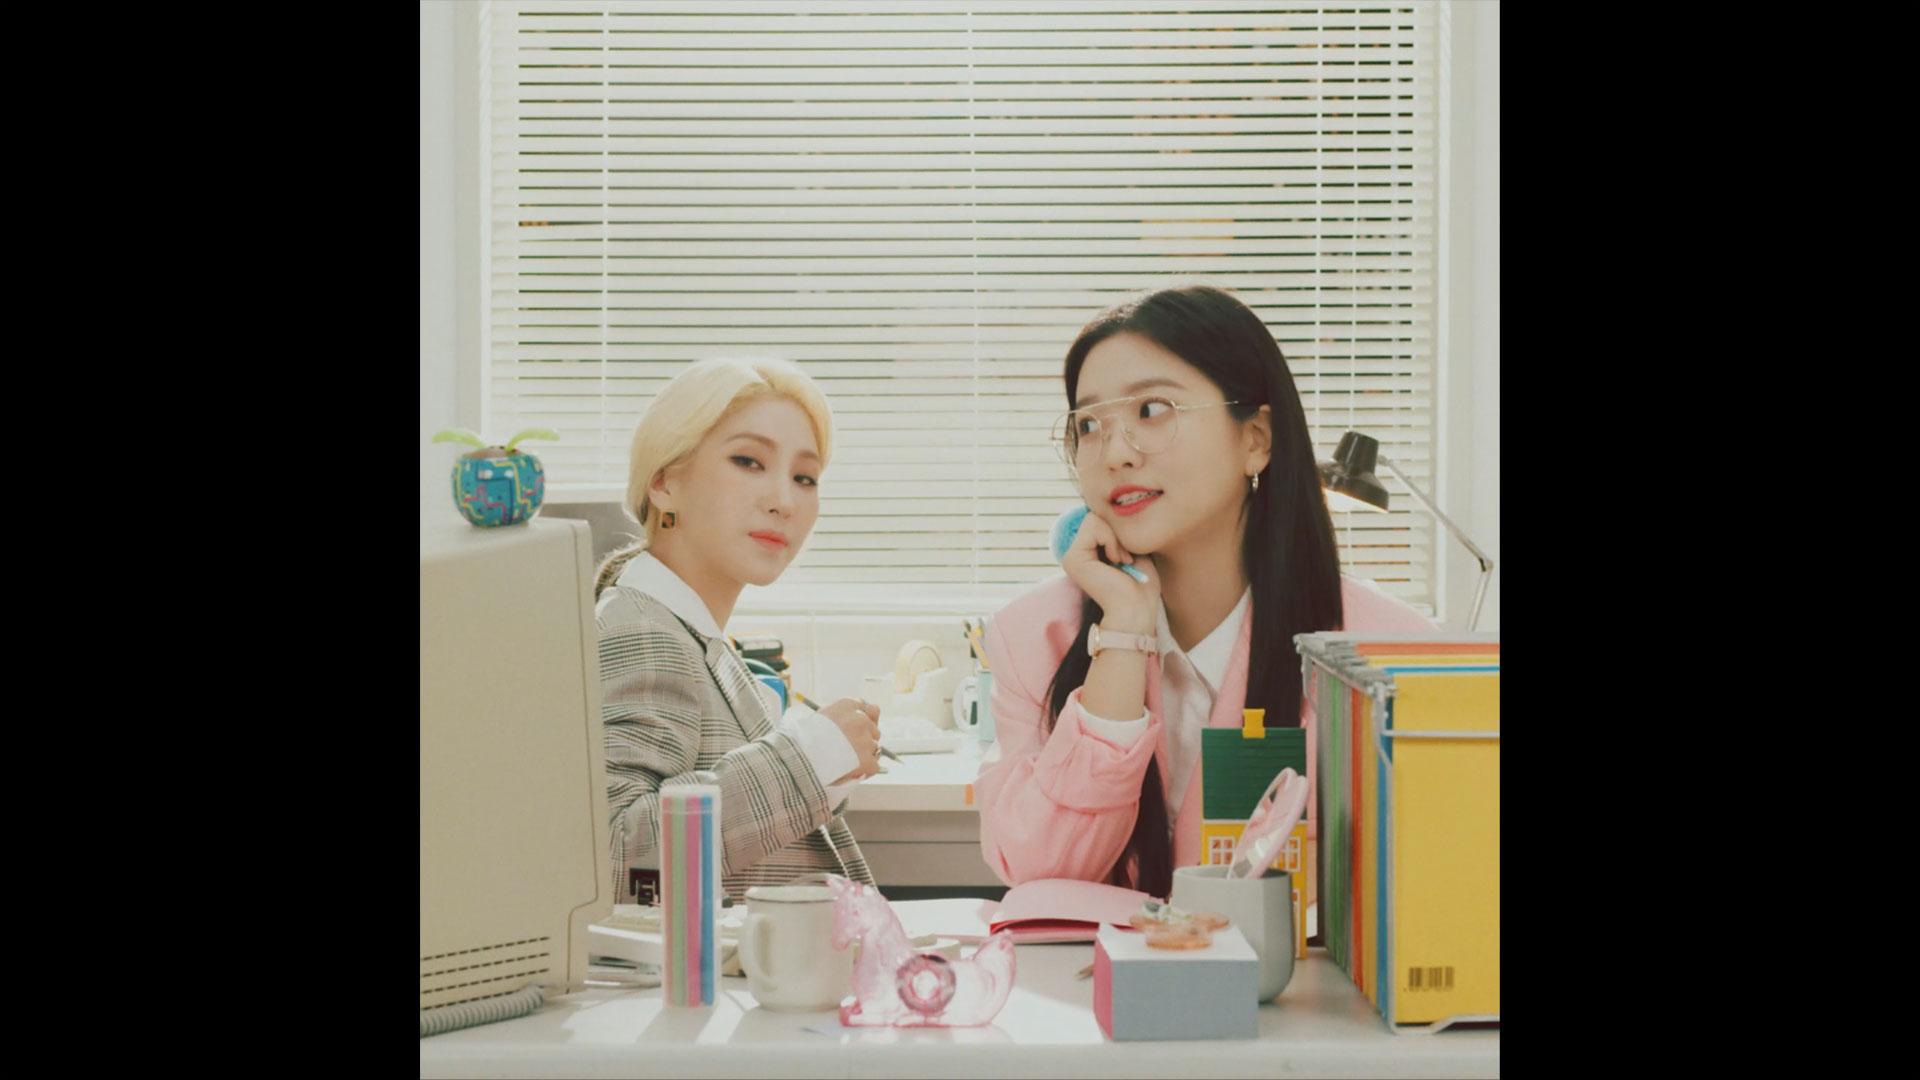 GIANT PINK 자이언트핑크 '월요일 보다는 화요일 (Feat. 예리 of Red Velvet)' MV